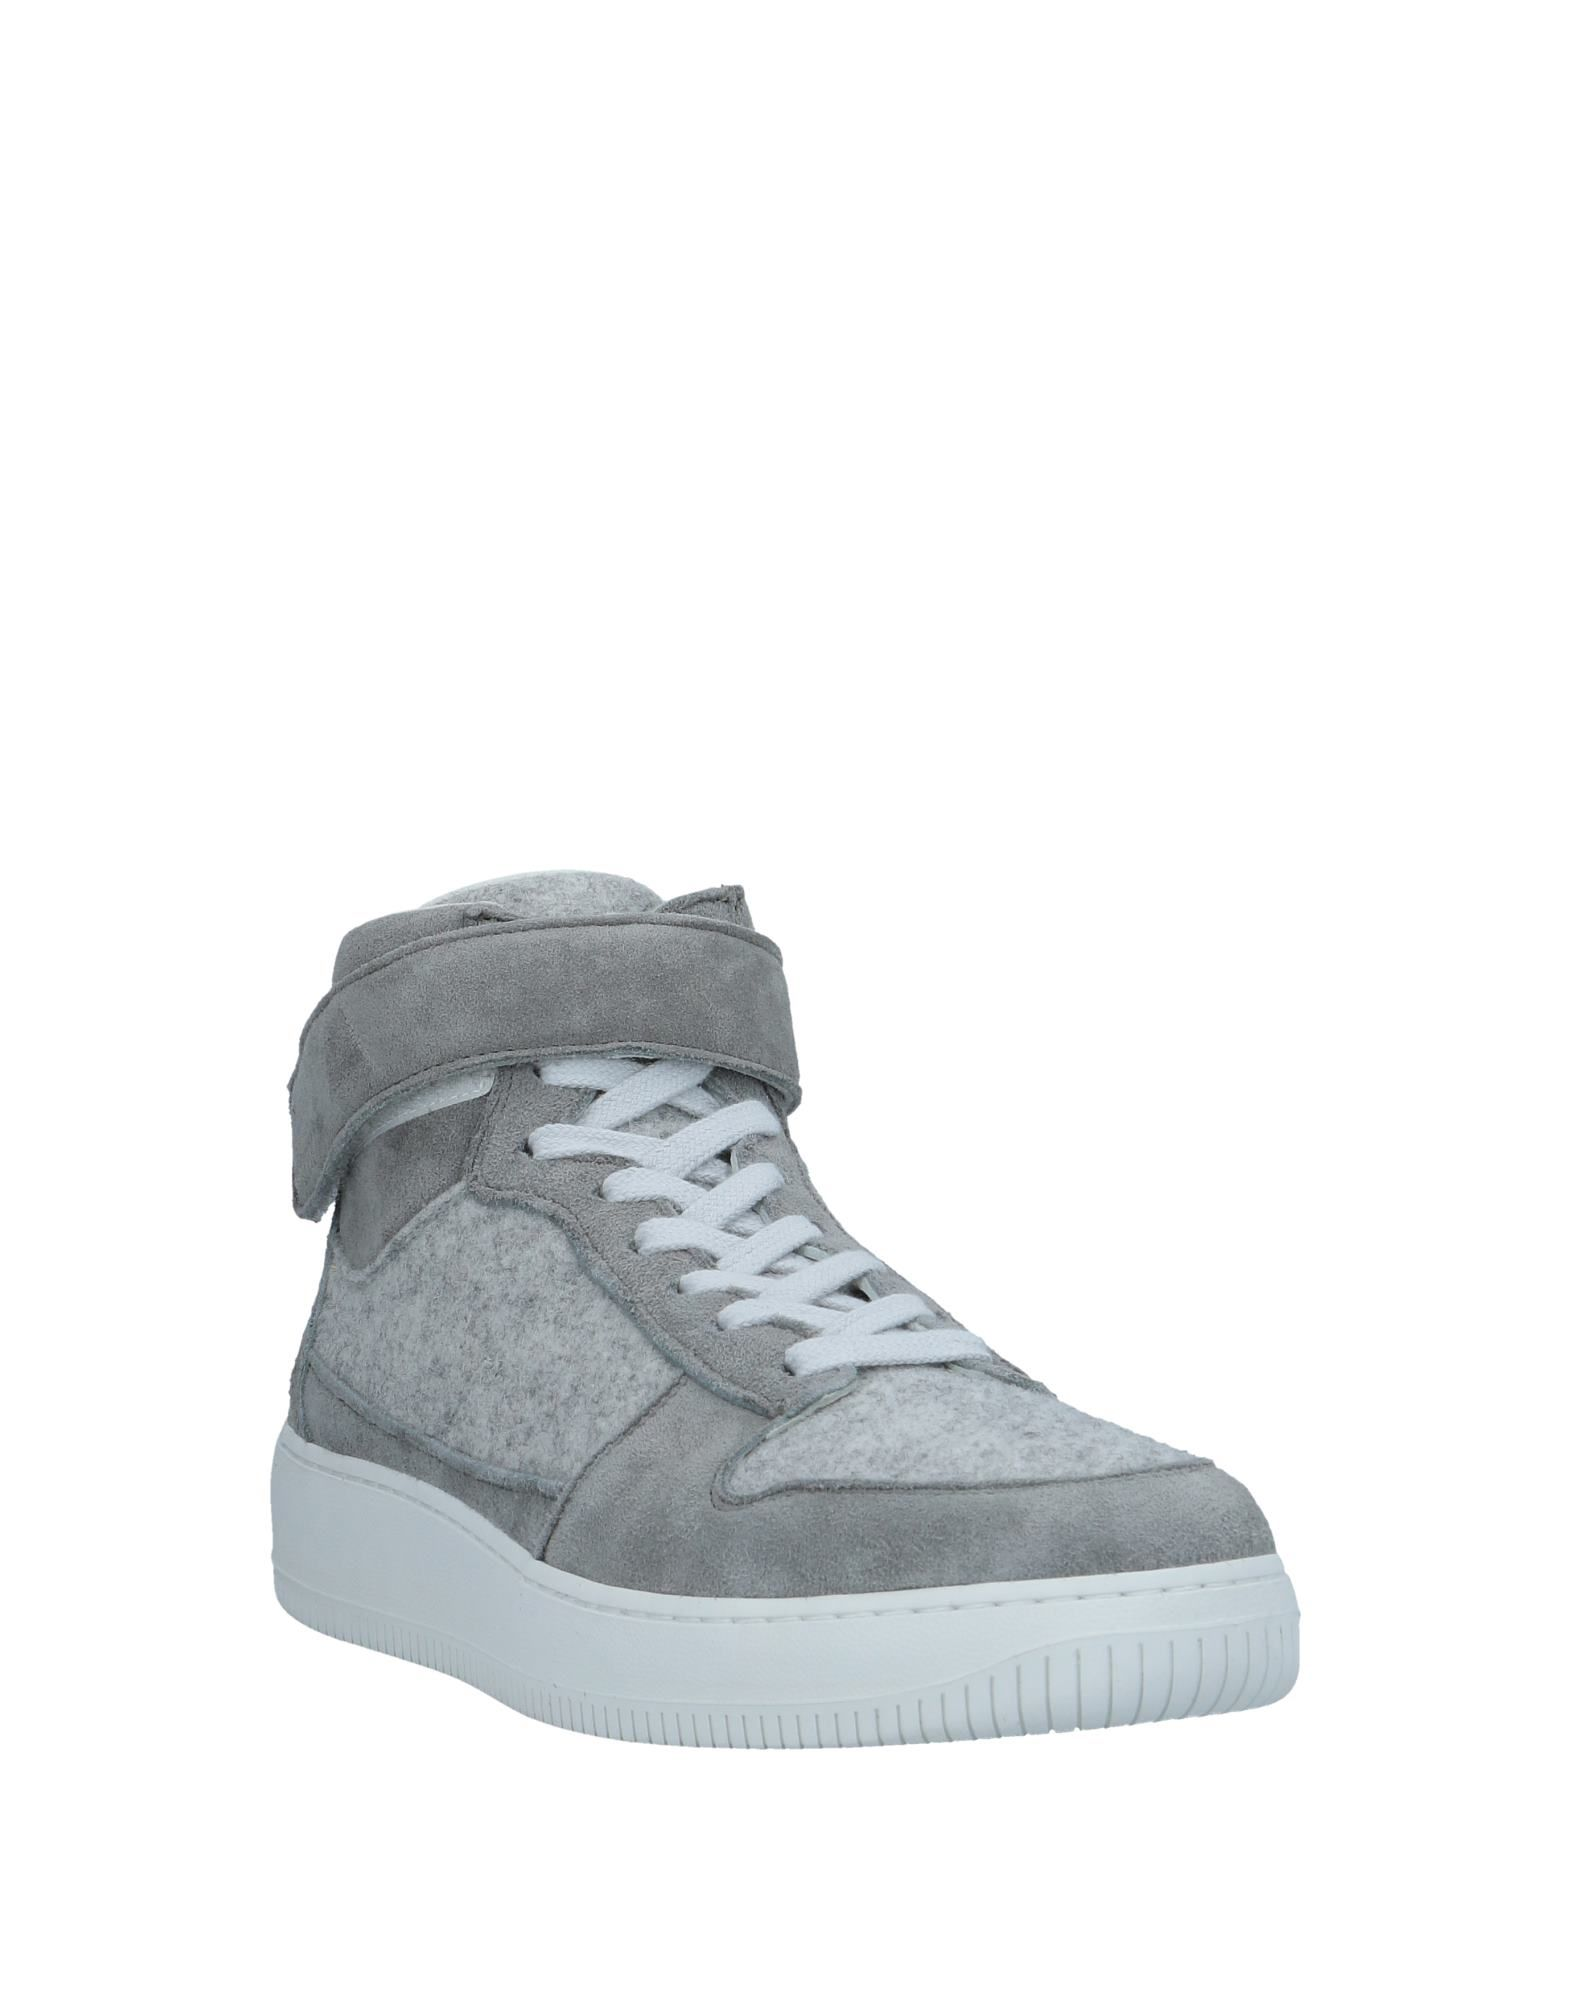 Diemme Sneakers Herren beliebte  11500555UF Gute Qualität beliebte Herren Schuhe e5b503